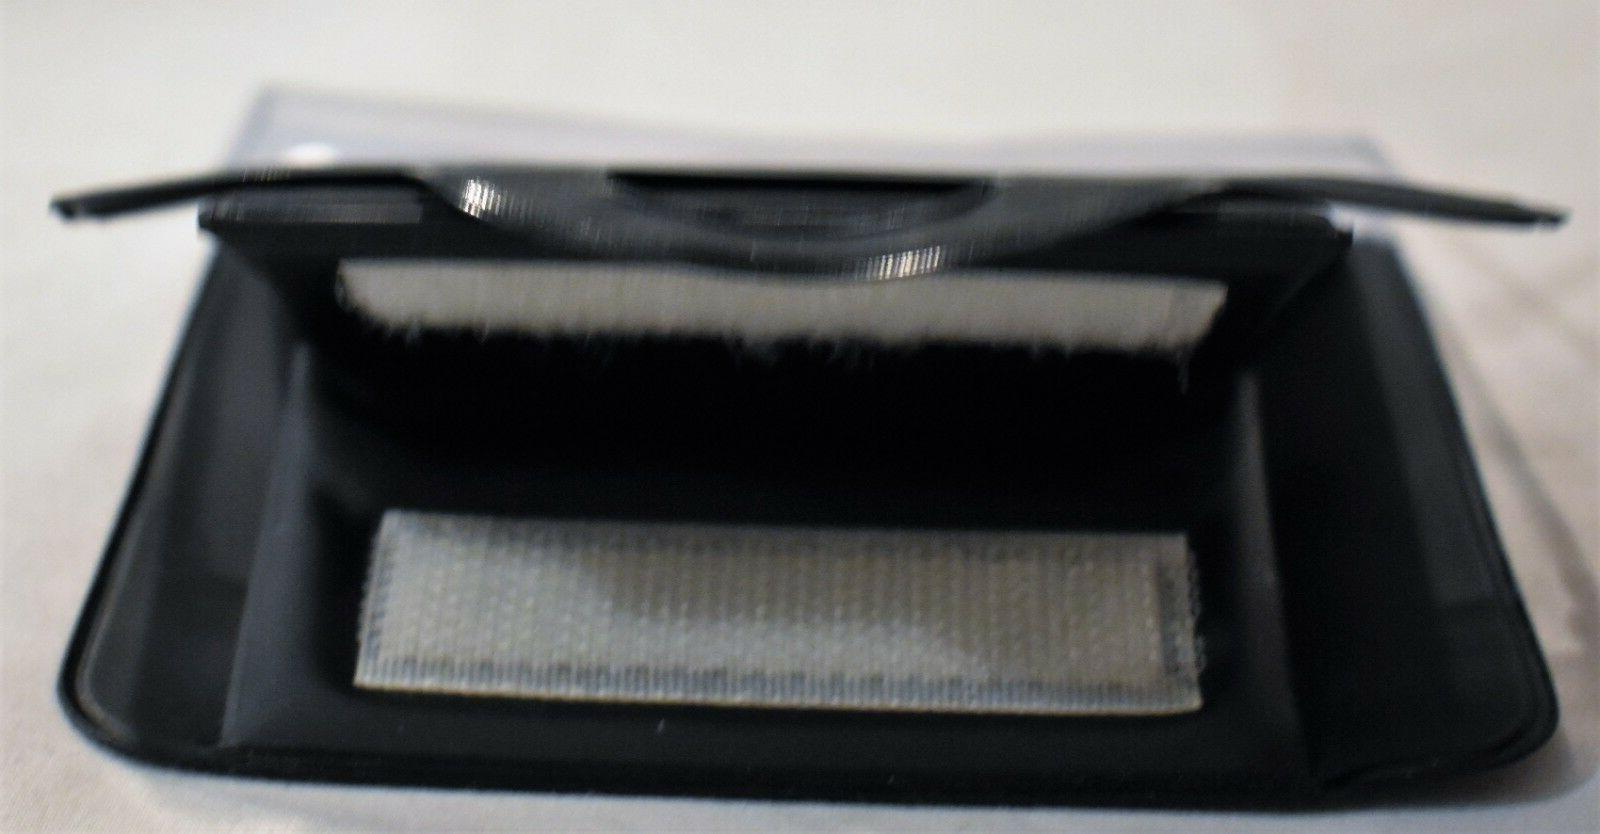 JOTO Universal Waterproof Bag Black, New, Free